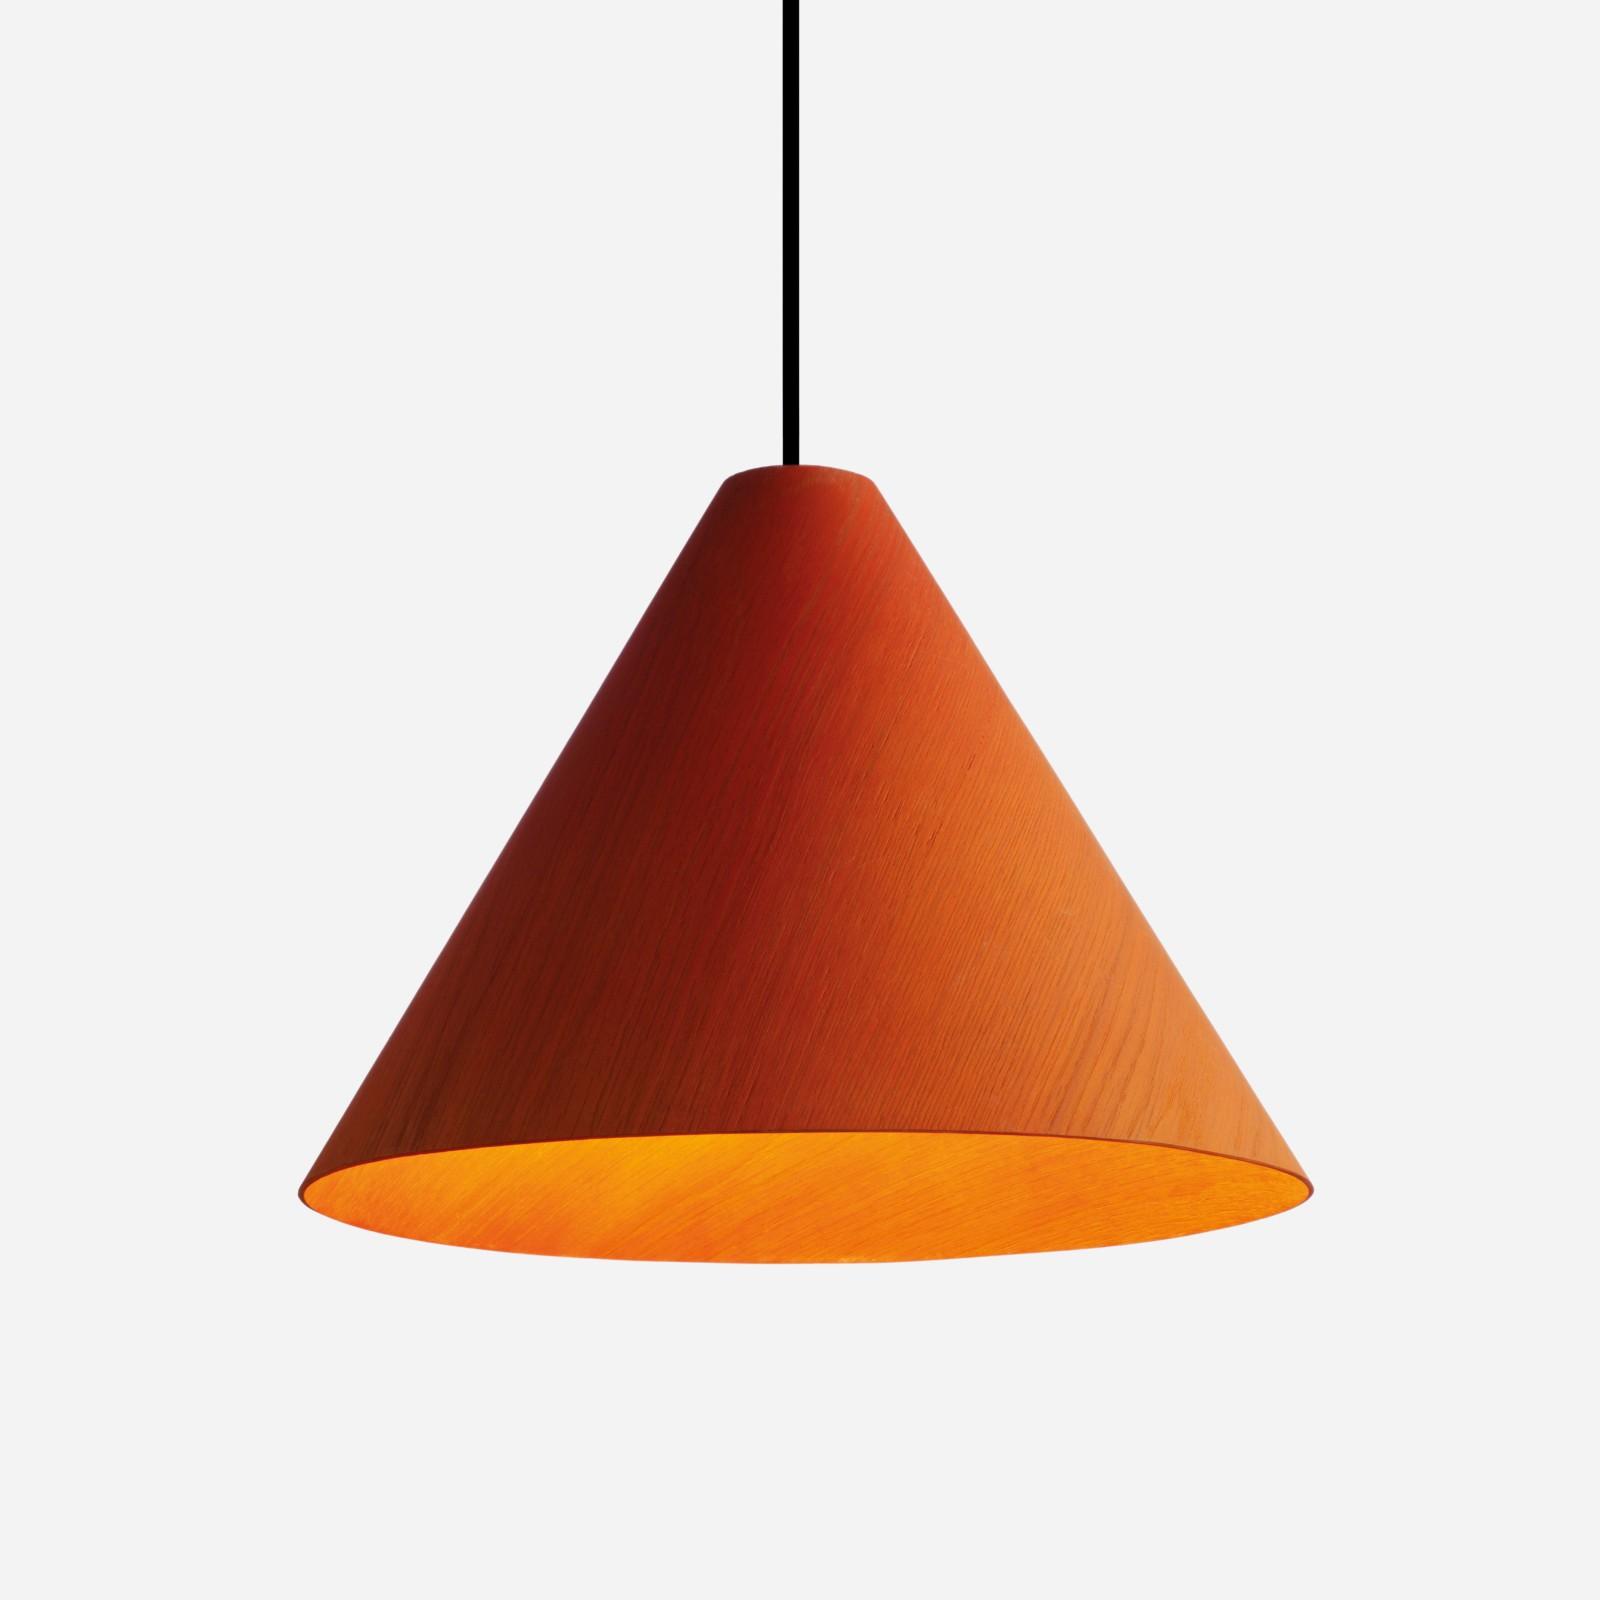 30degree Lamp Shade Orange Shade, Black Cordset, Small